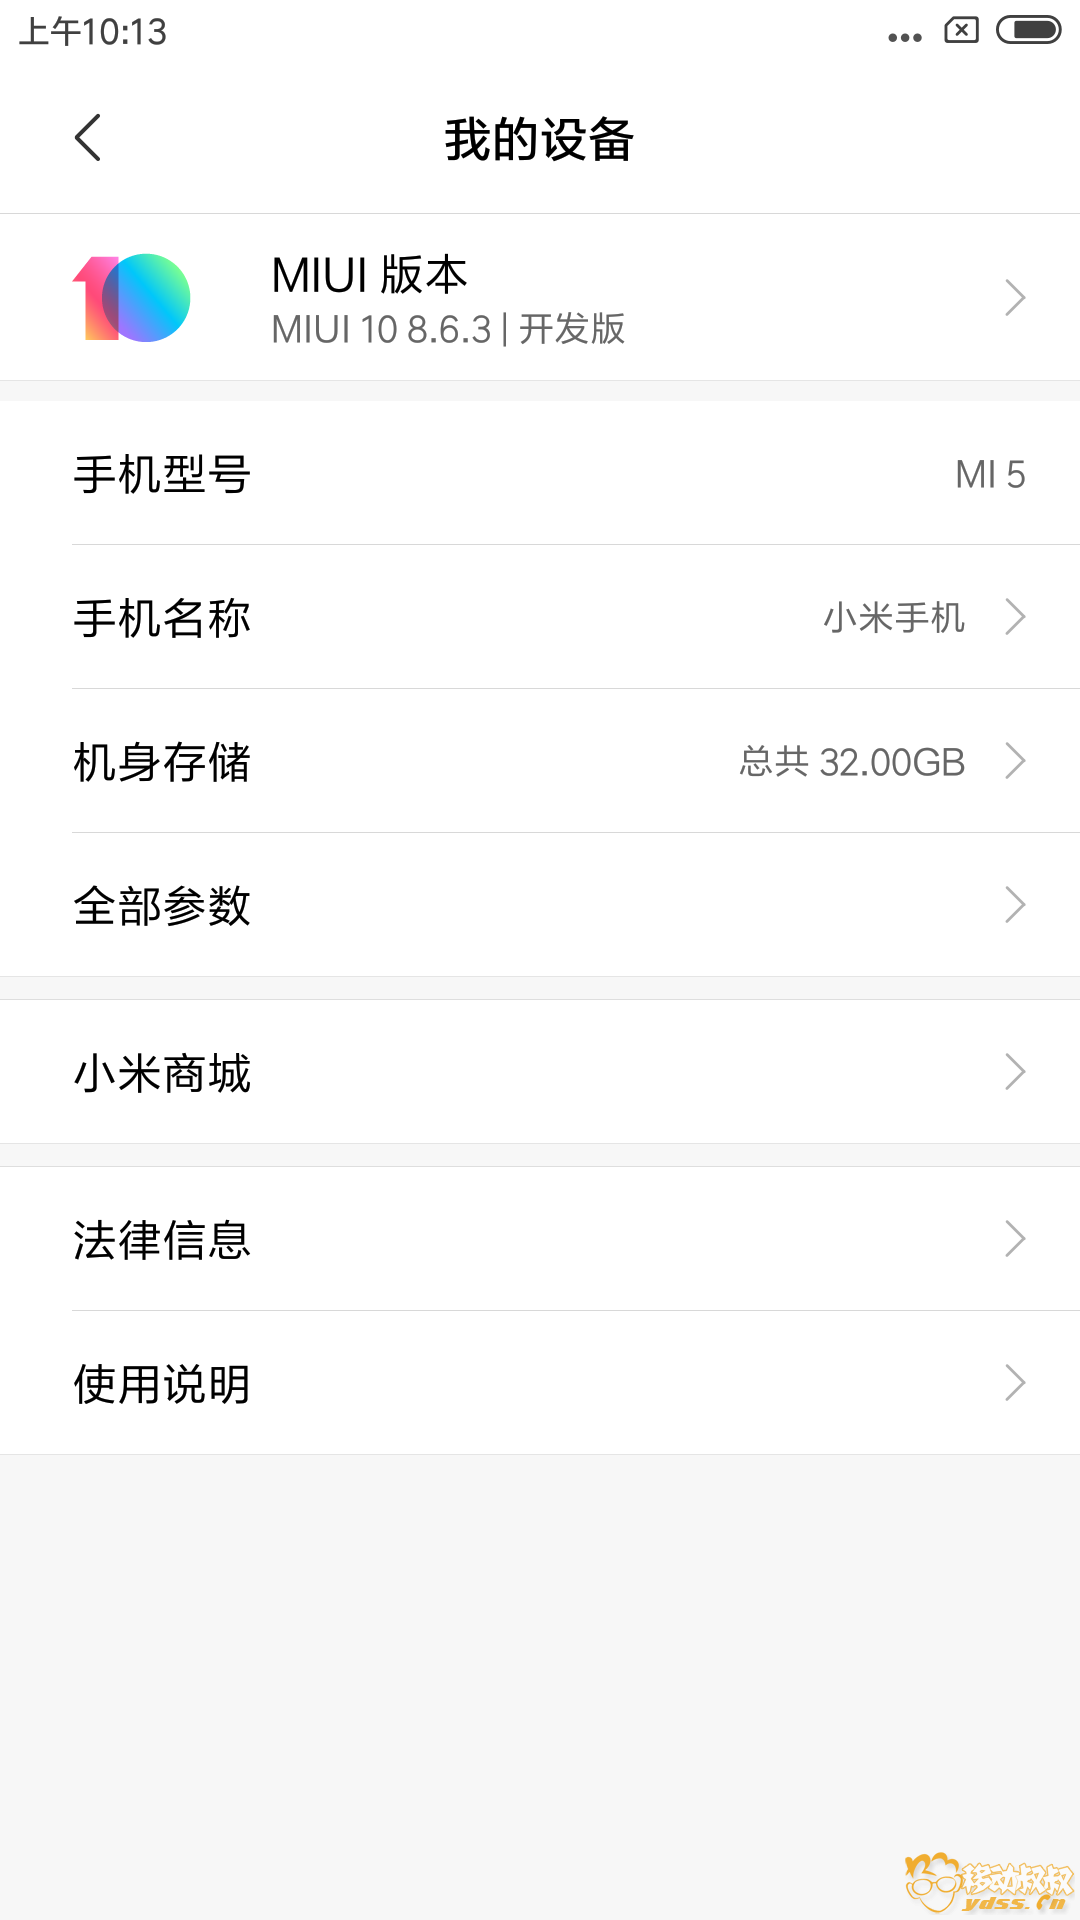 Screenshot_2018-06-03-10-13-11-196_com.android.settings.png